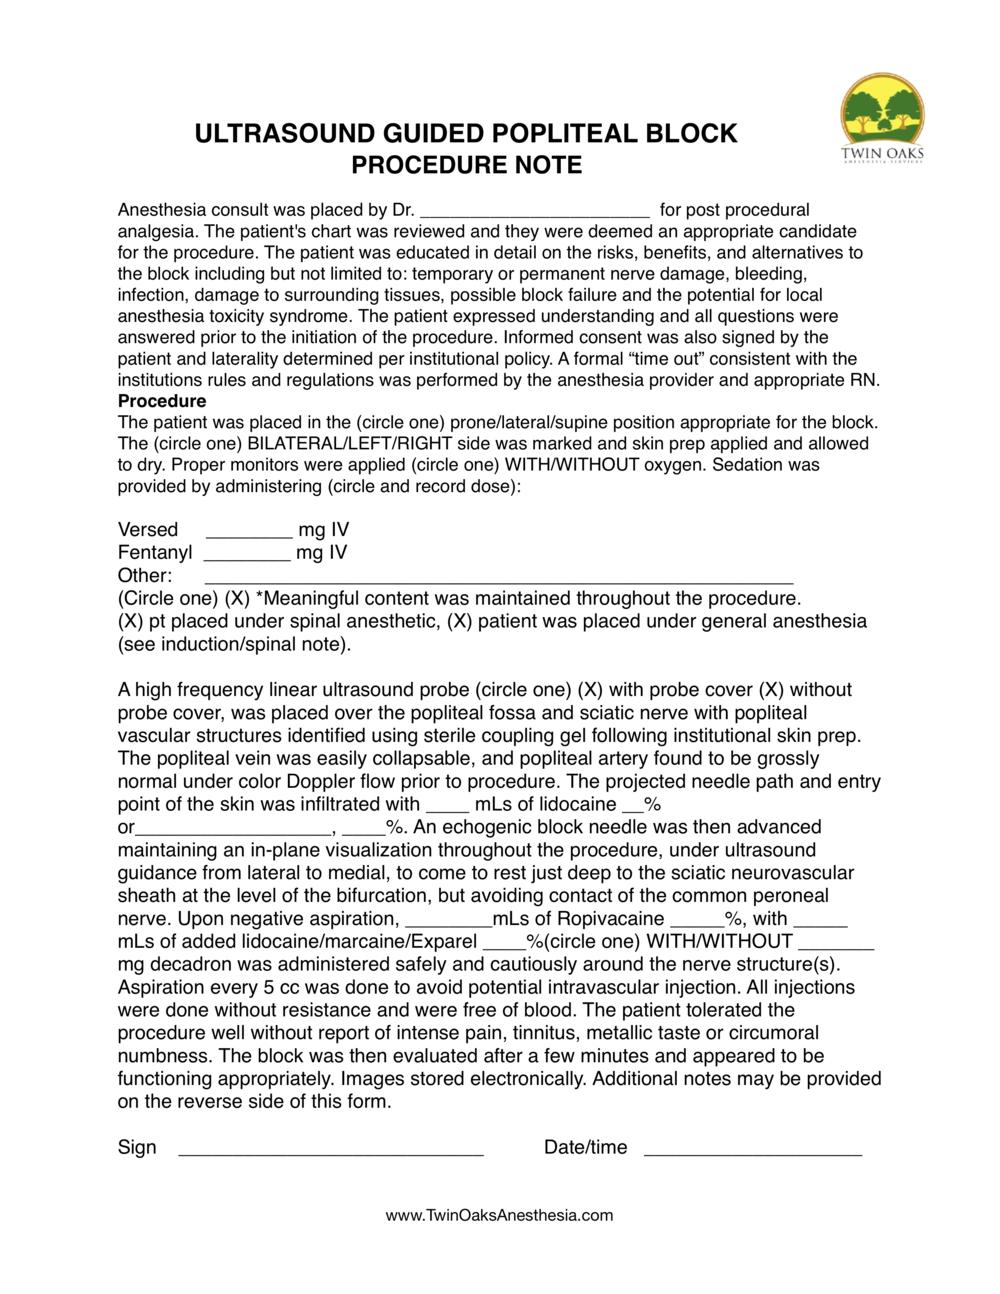 Popliteal block Procedure Form.png